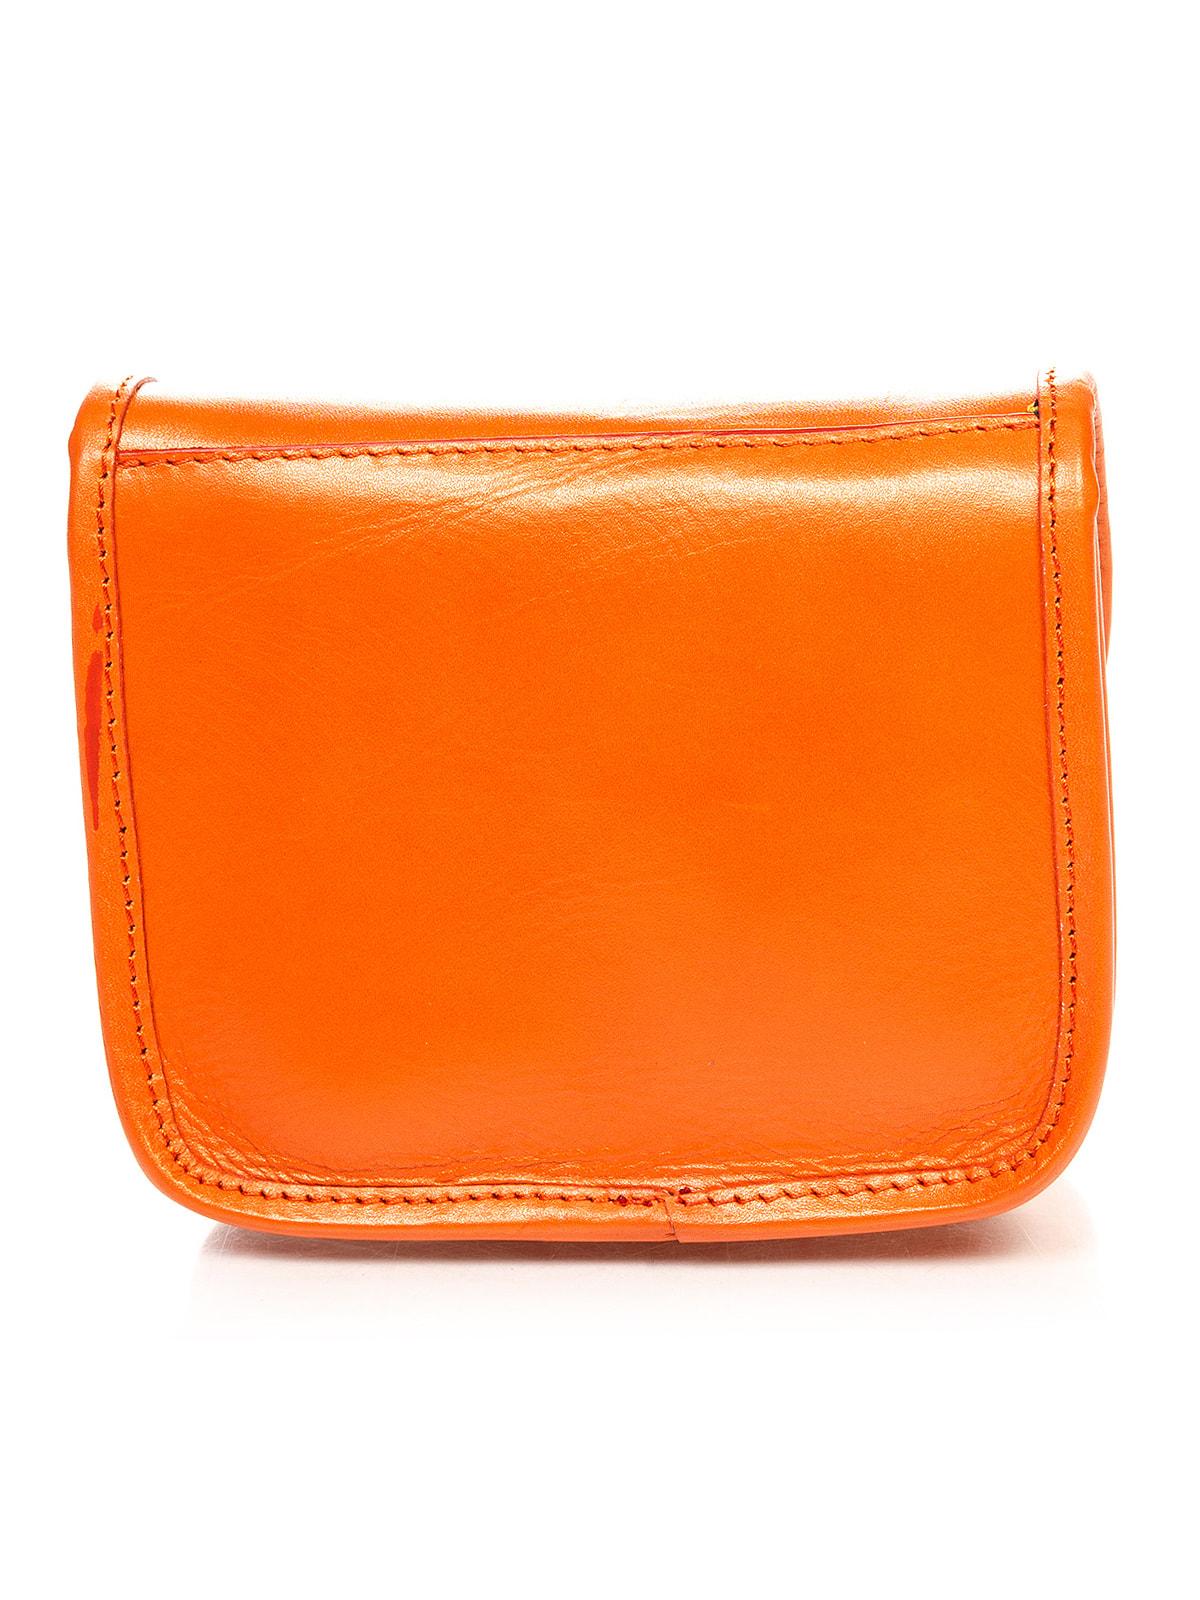 Сумка оранжевая | 4654275 | фото 2